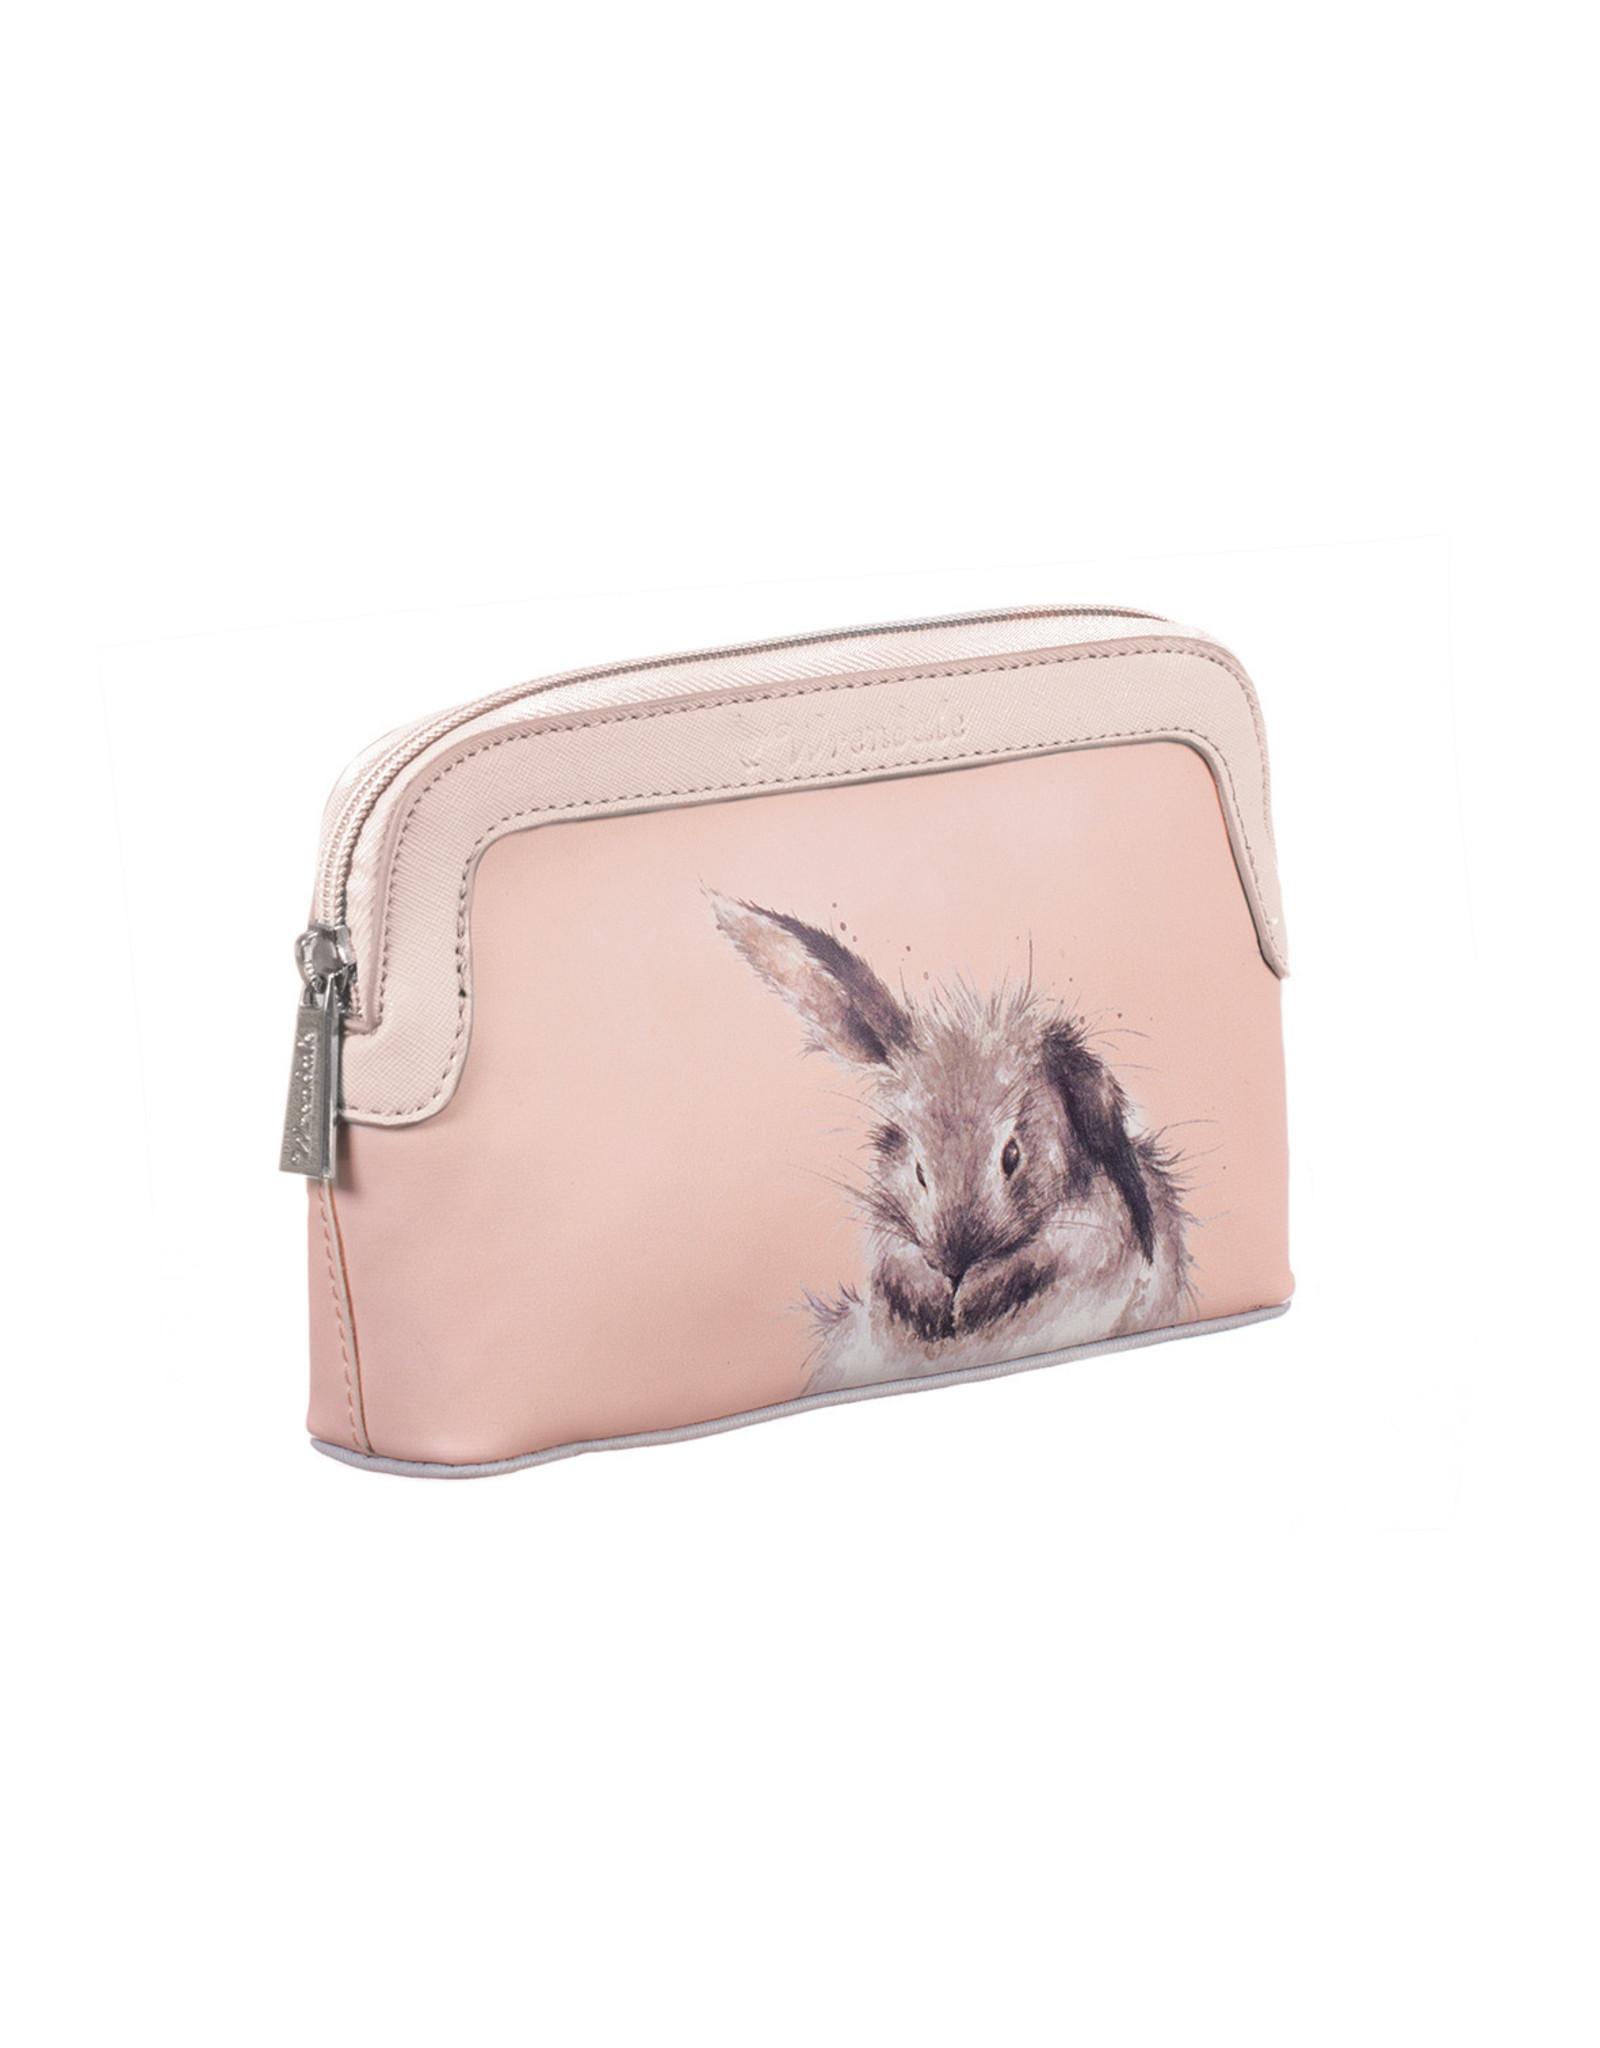 Wrendale Make-uptas - Pink Bunny